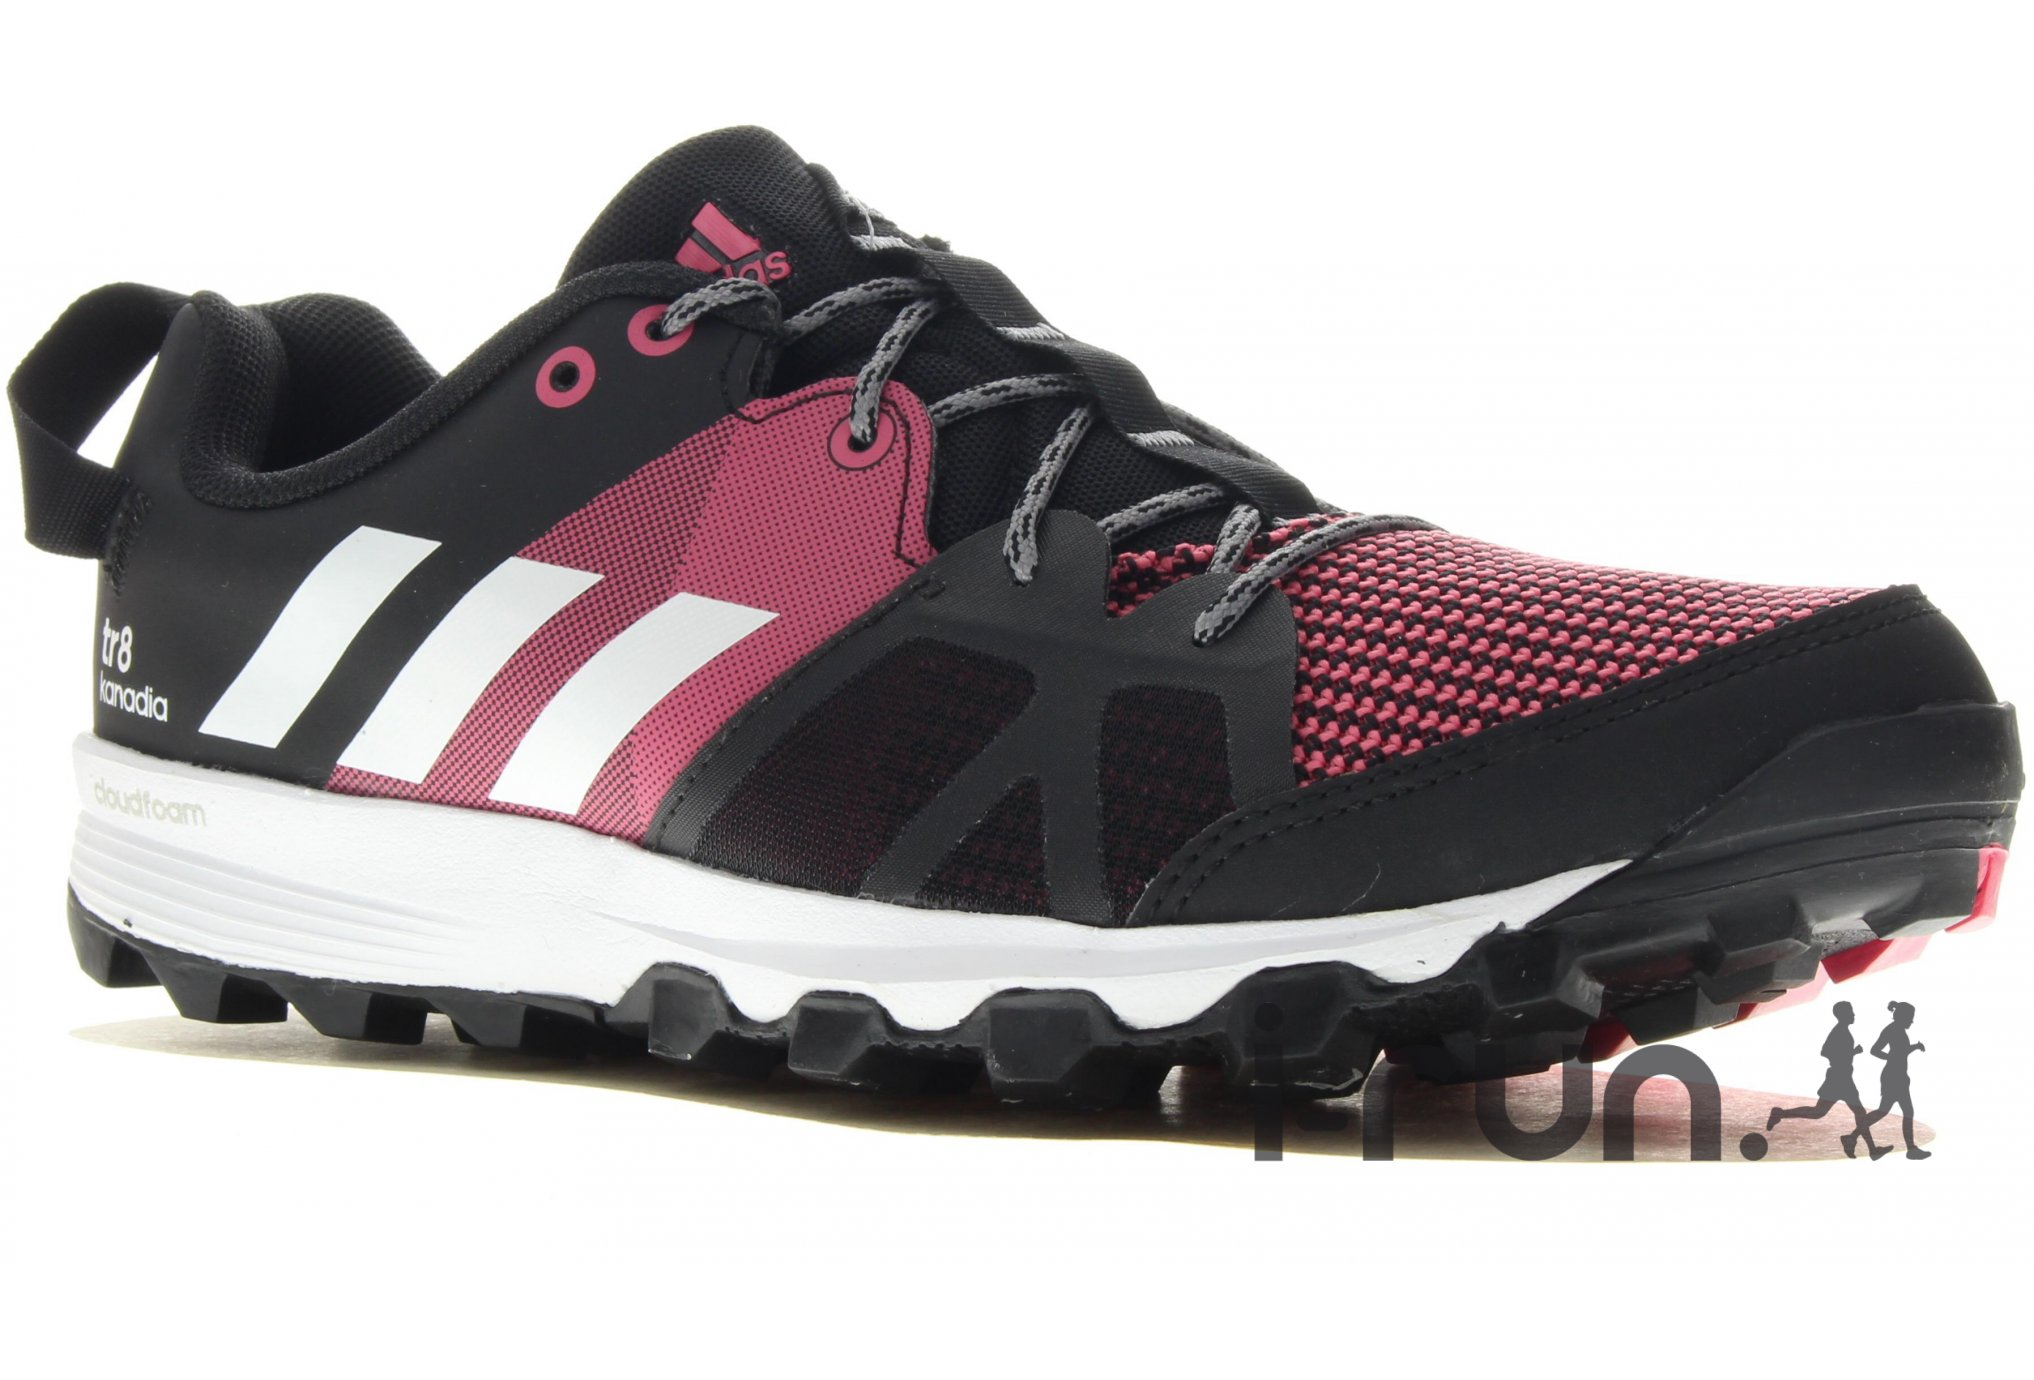 Adidas Kanadia 8 tr w chaussures running femme